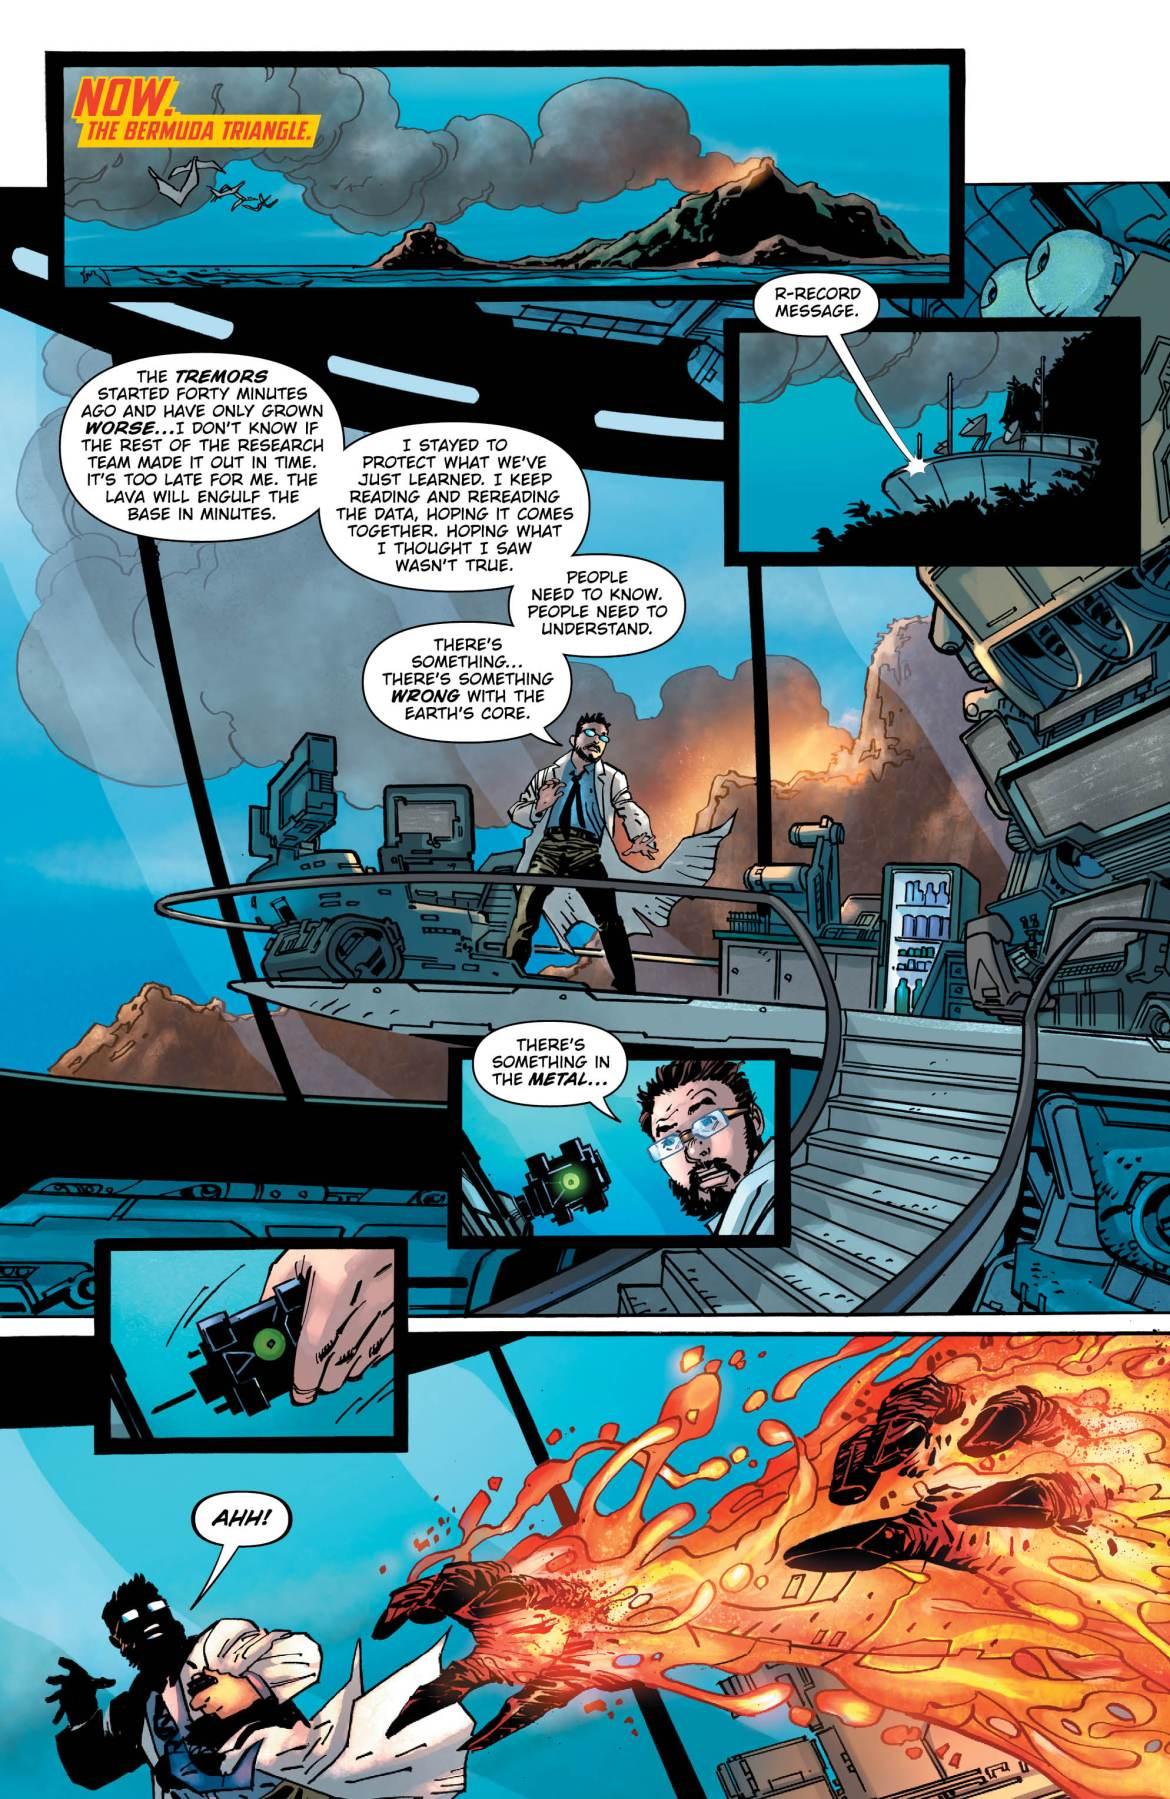 Dark Days The Forge 3 -DC Comics News